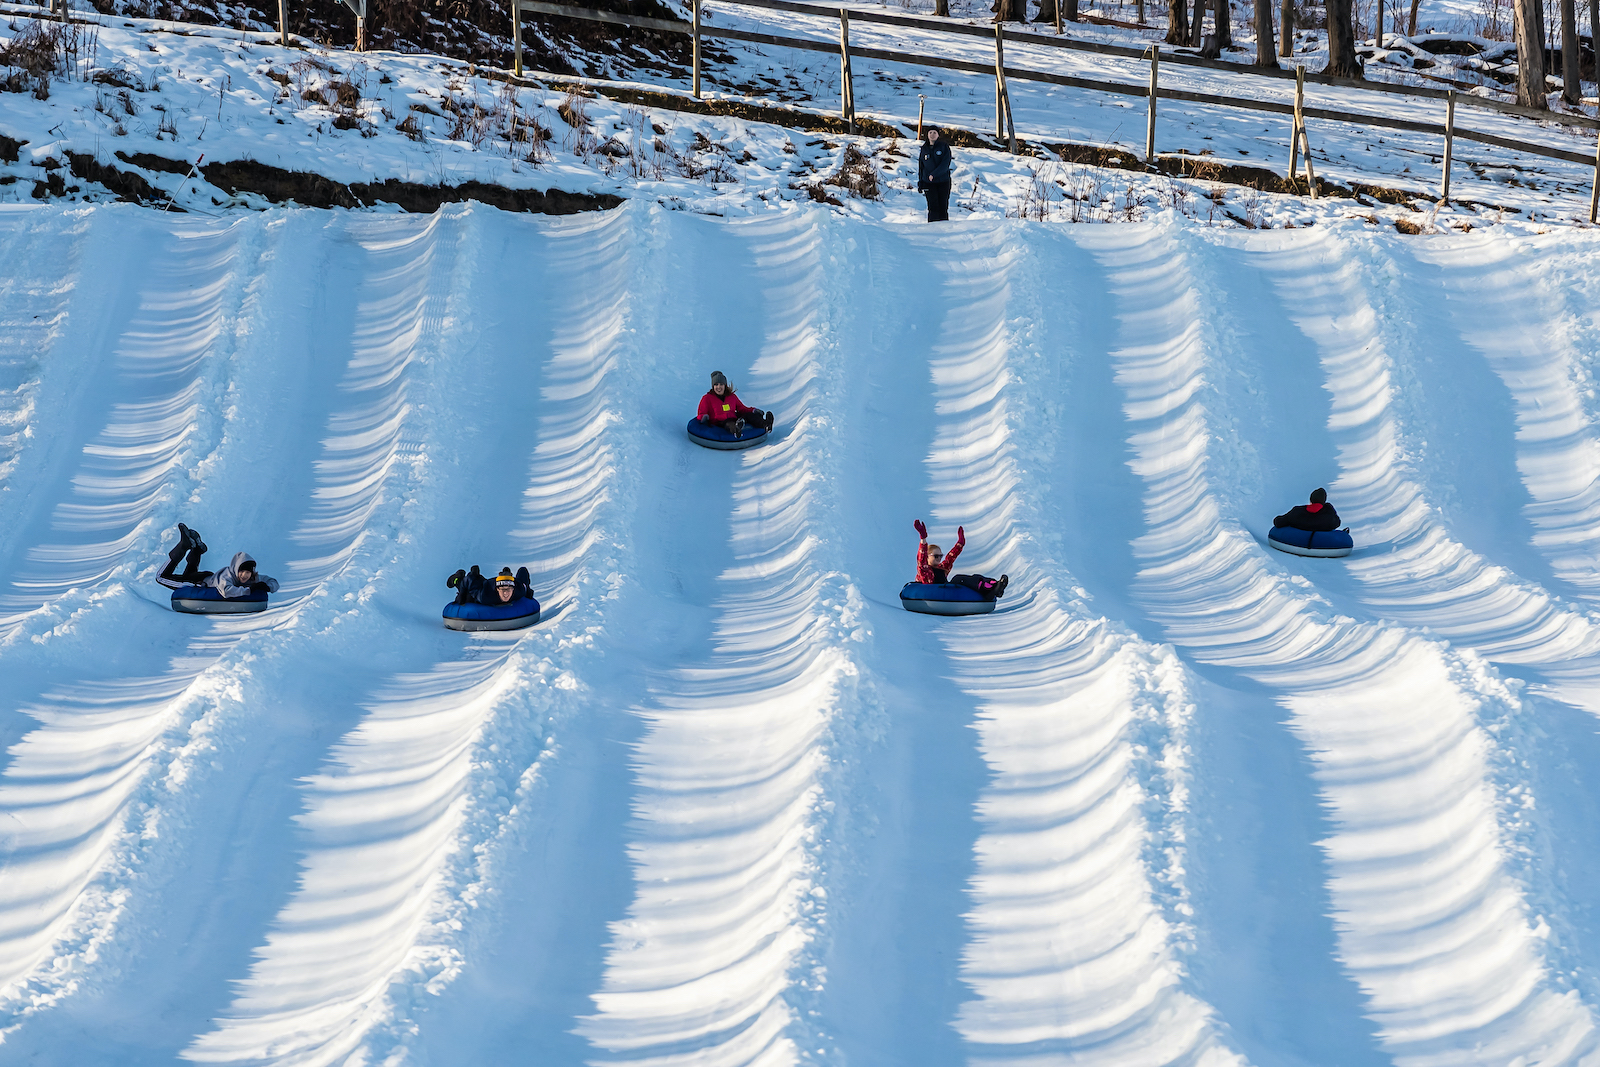 snow tubing at mount pleasant in edinboro pa